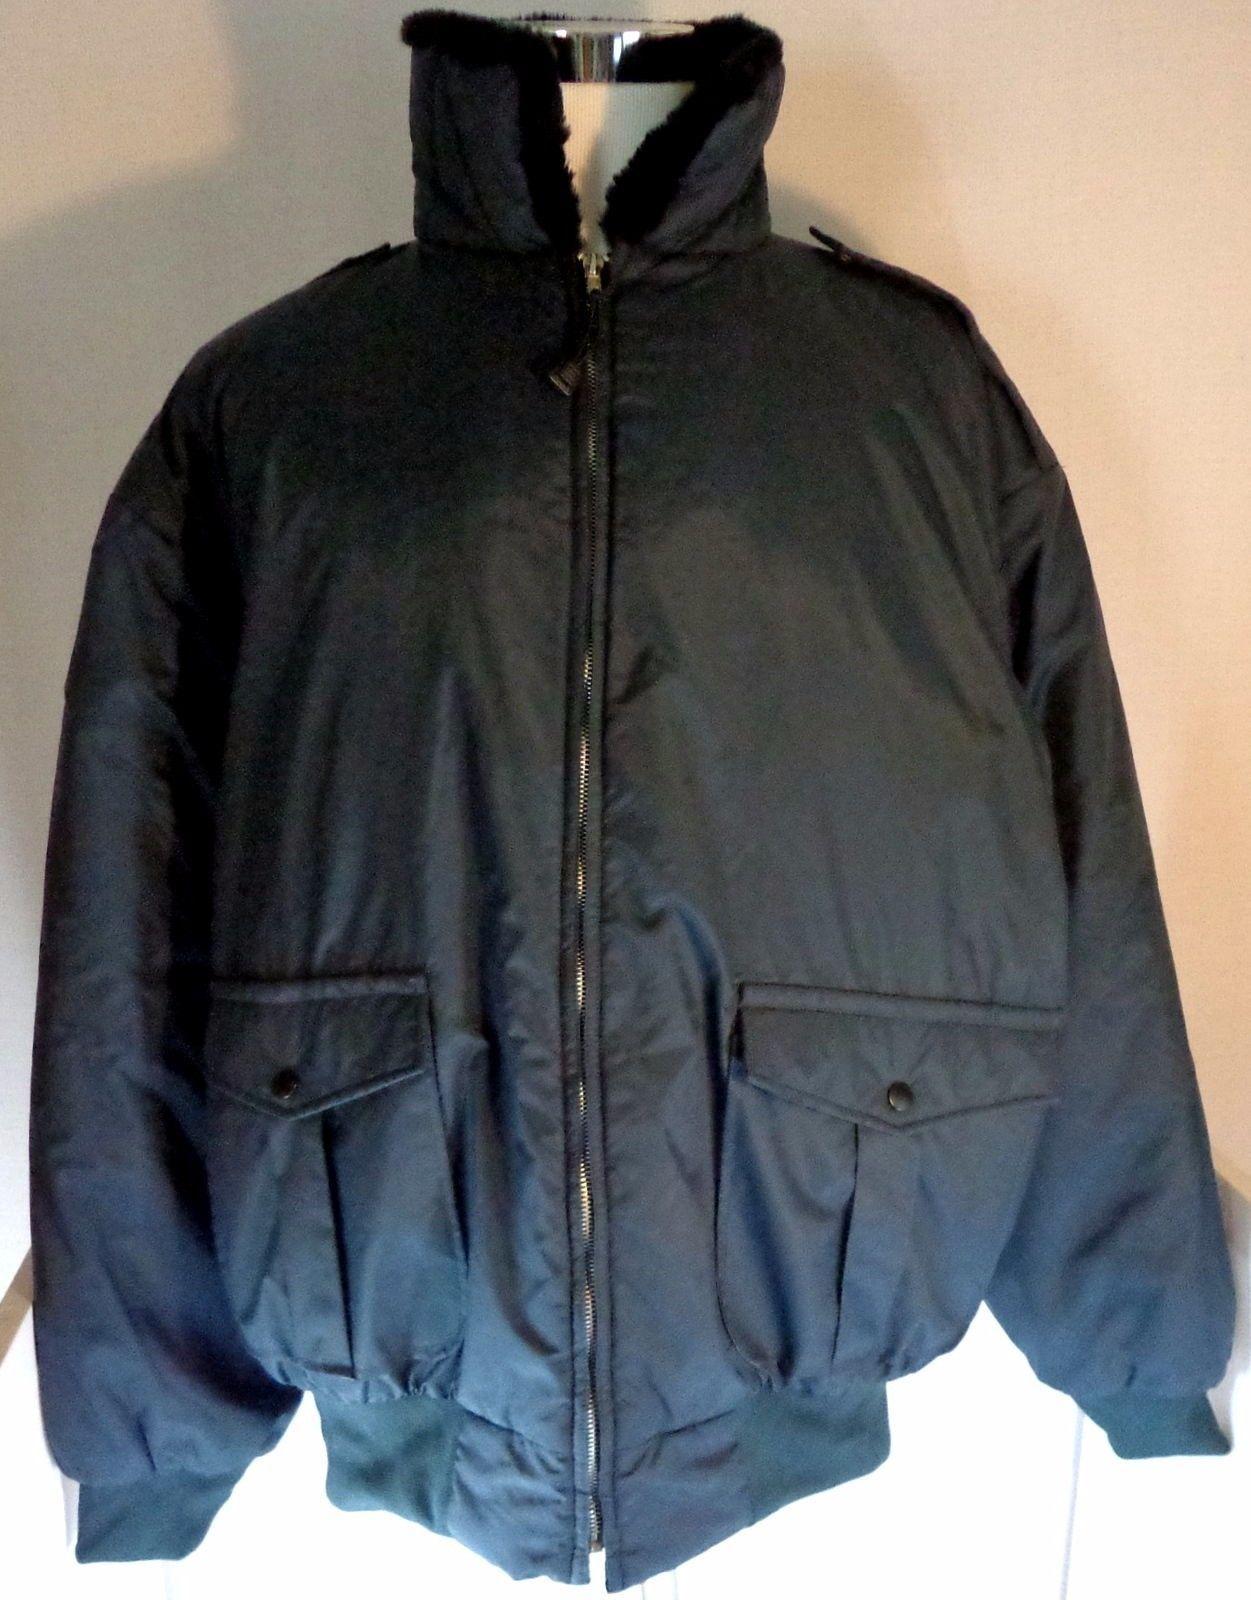 Men's I. Spiewak Bomber Jacket XL Tall Navy Blue Nylon Black Faux Fur Collar